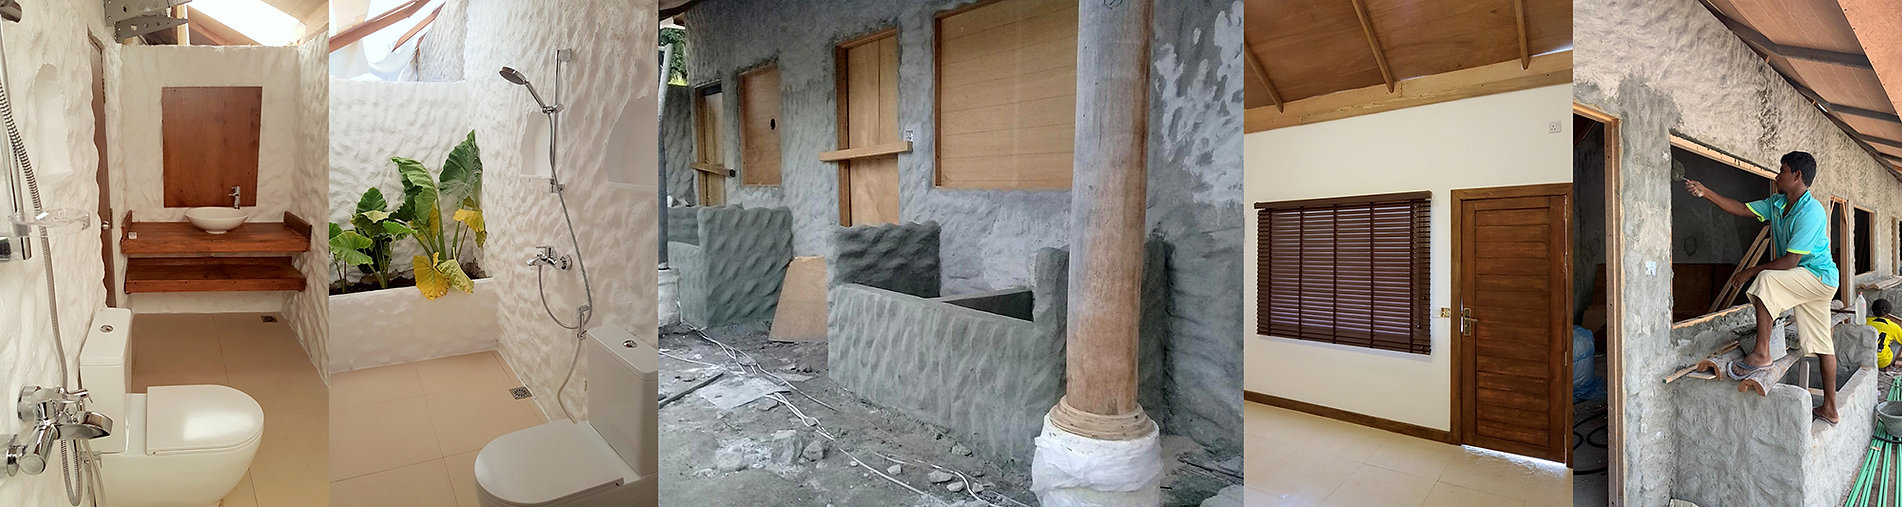 Kotari or Rooms at Atholhu Residence, Fehendhoo, Maldives